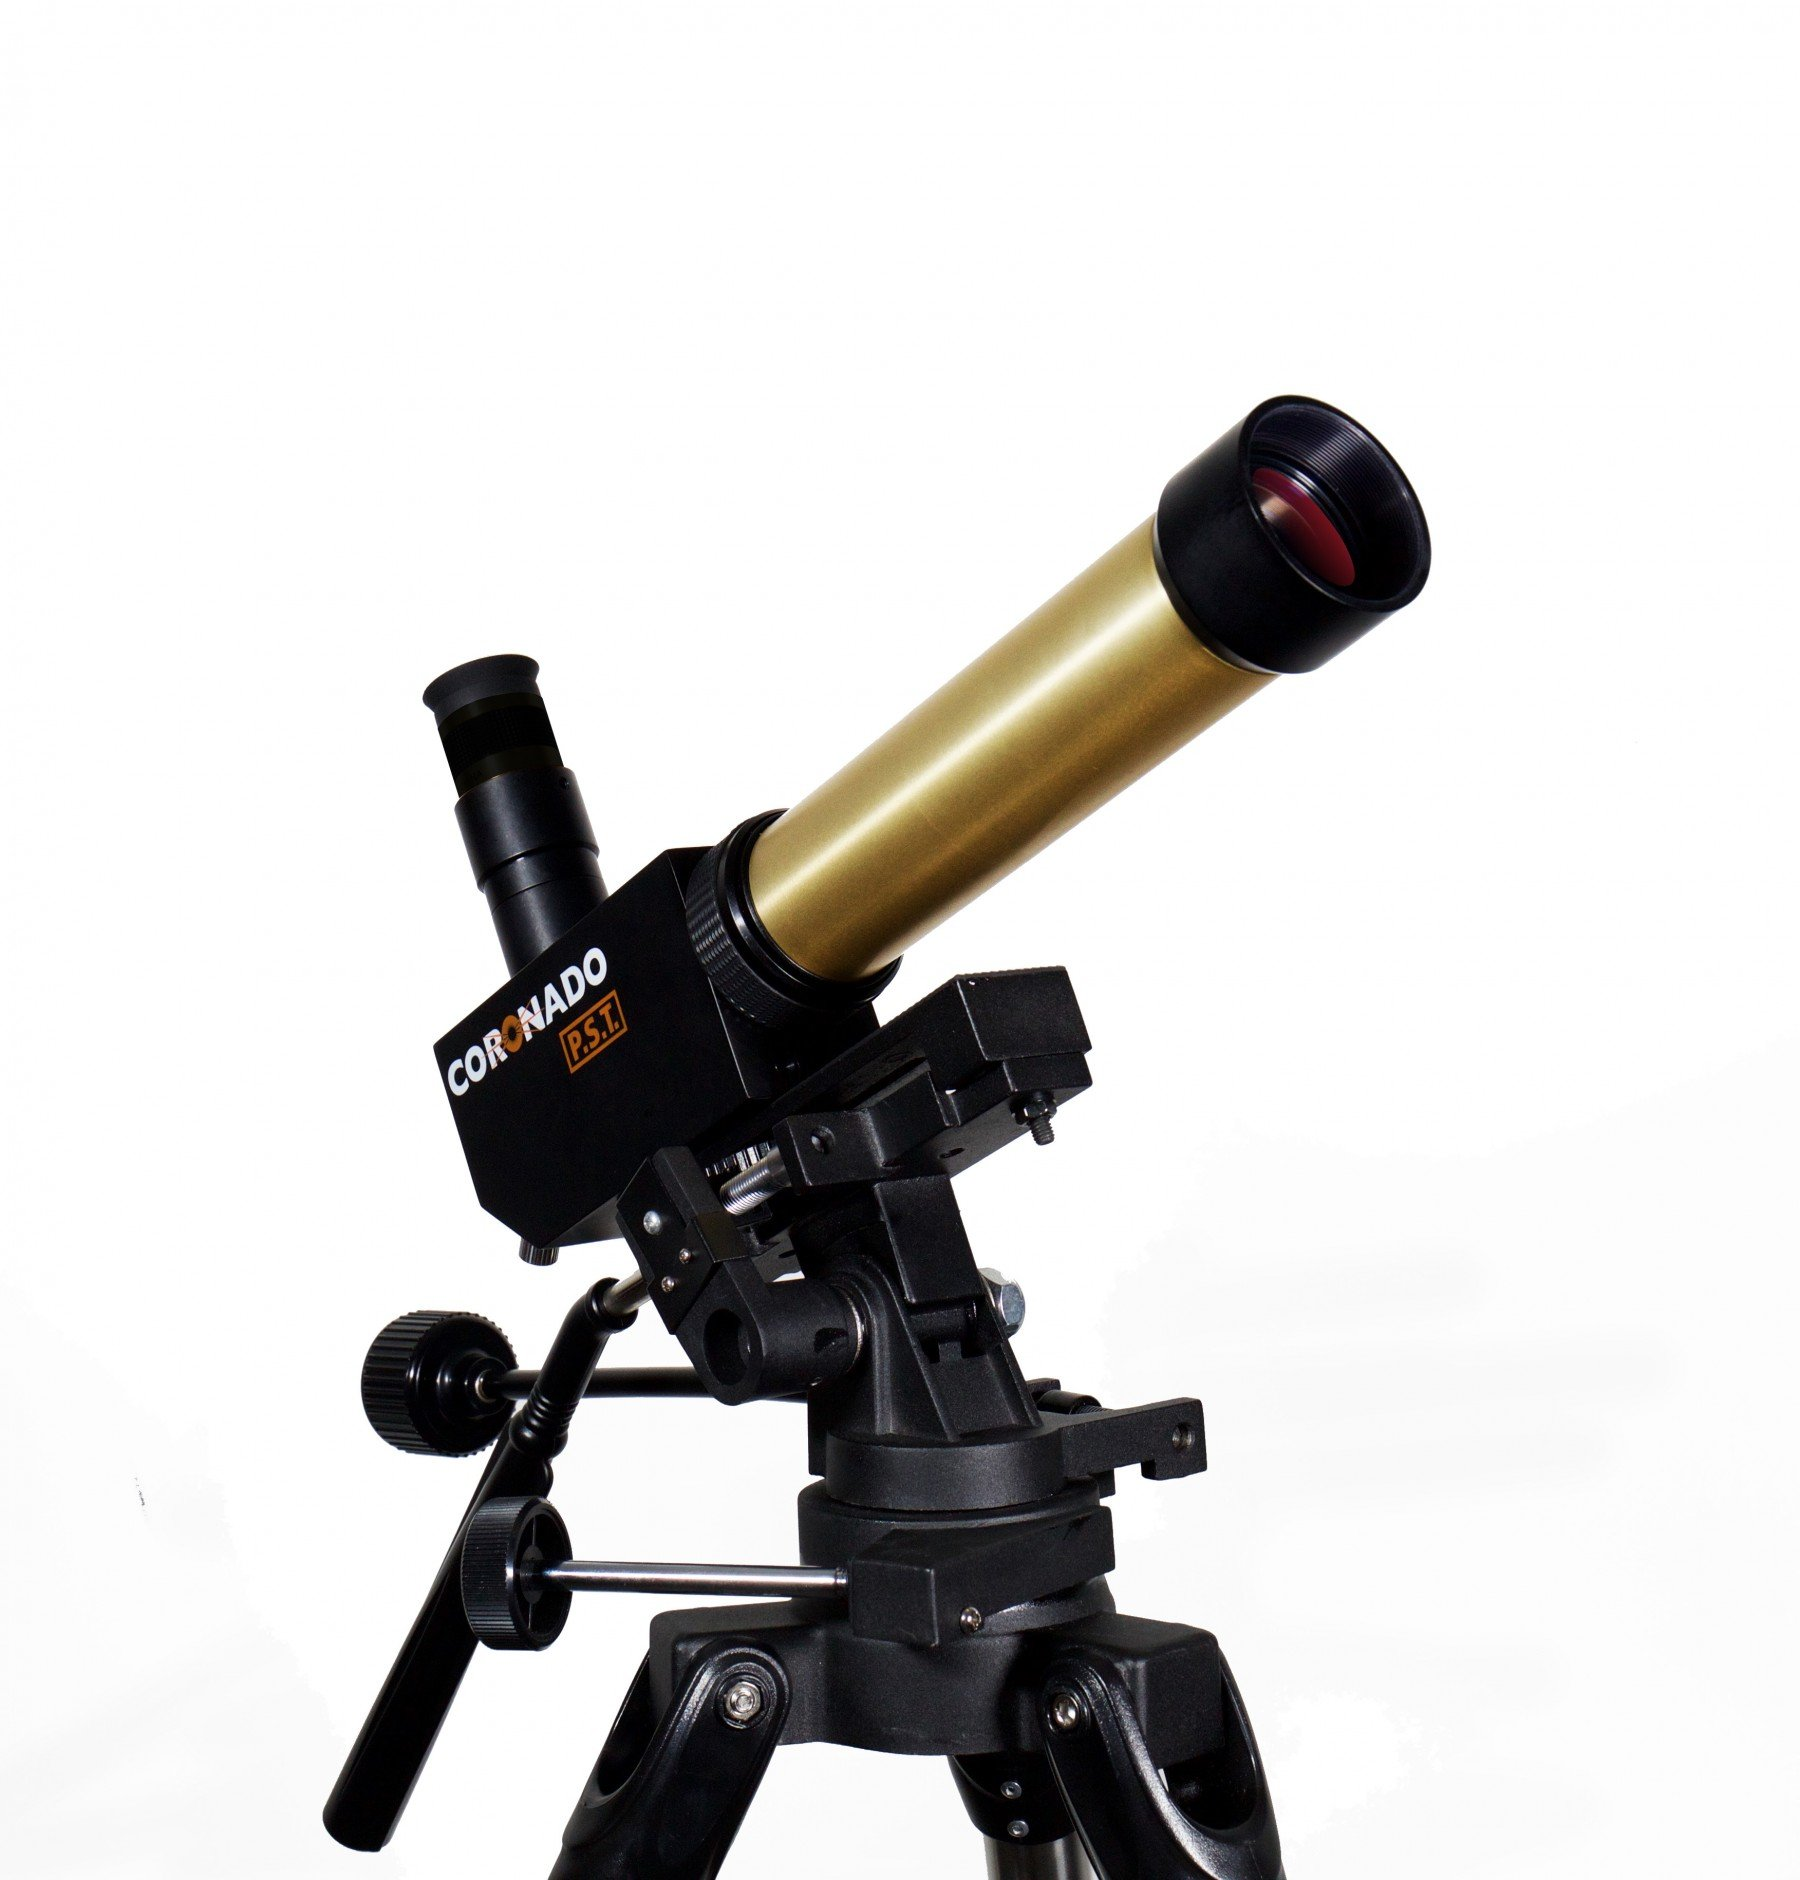 Meade Instruments Cornado PST Personal Solar Telescope by Meade Instruments